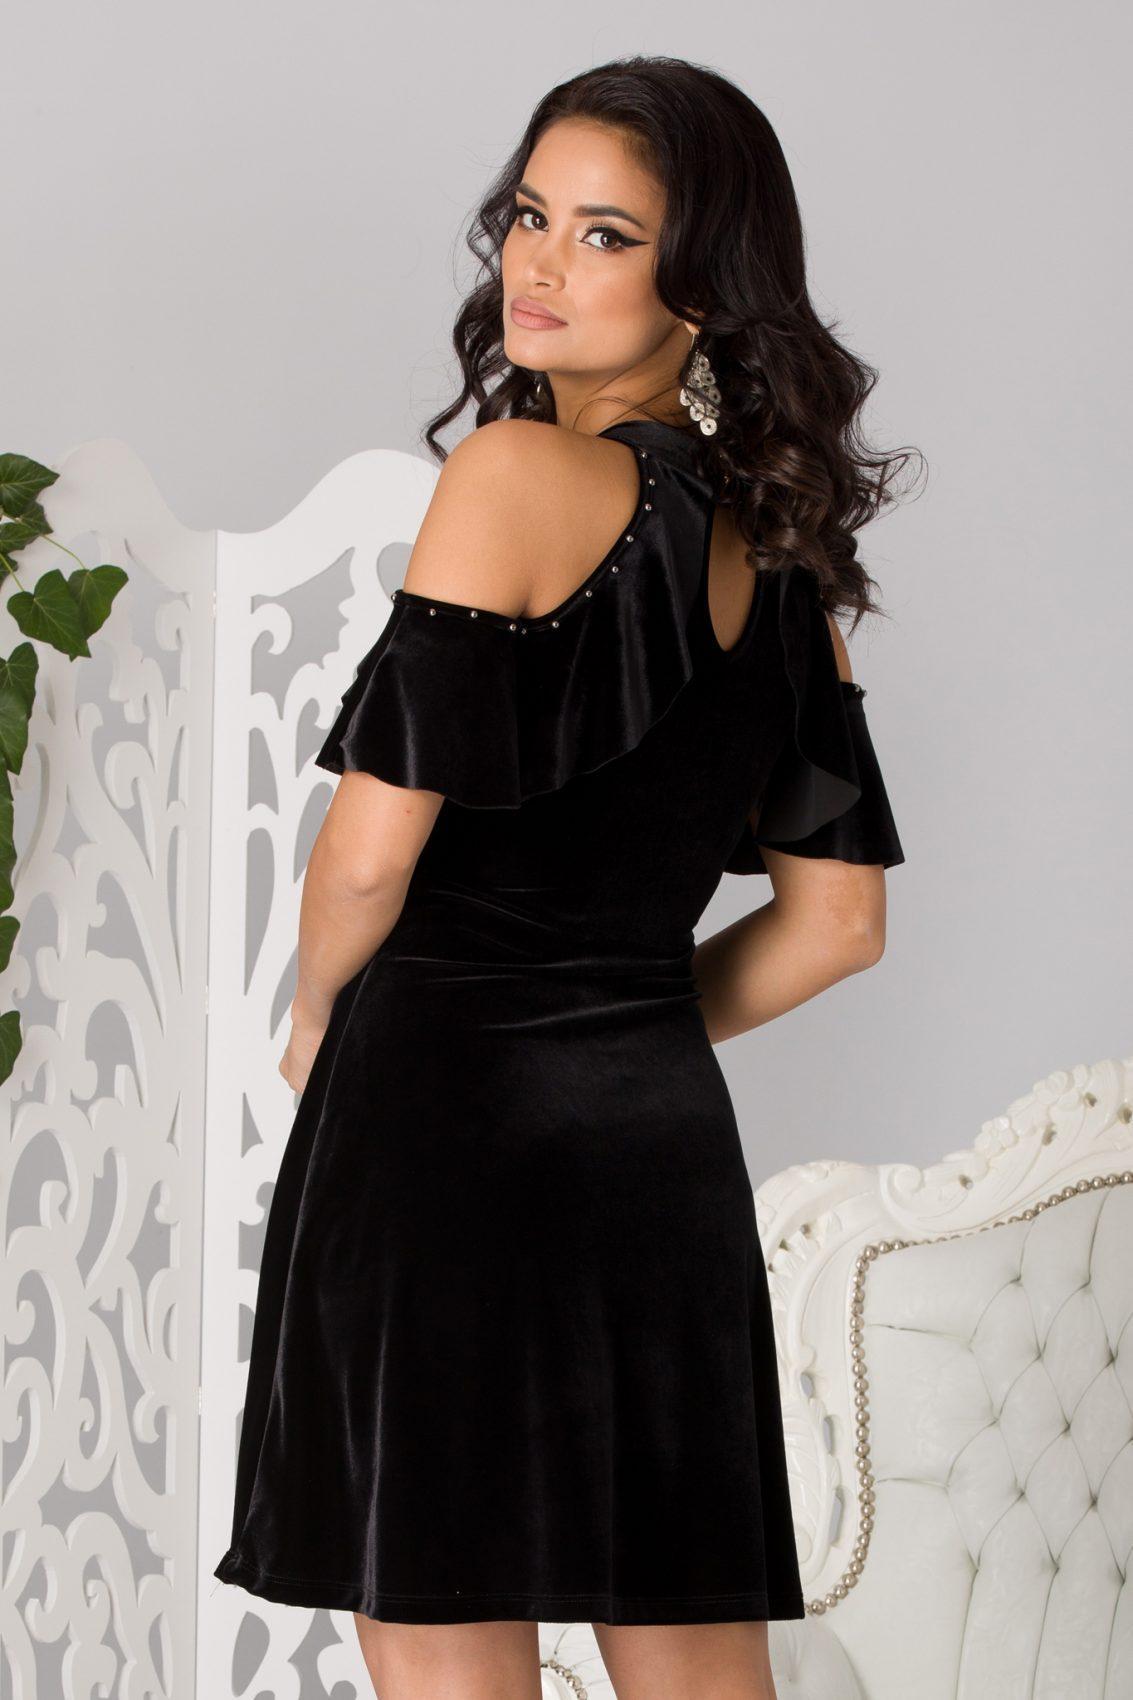 Mabel Black Dress